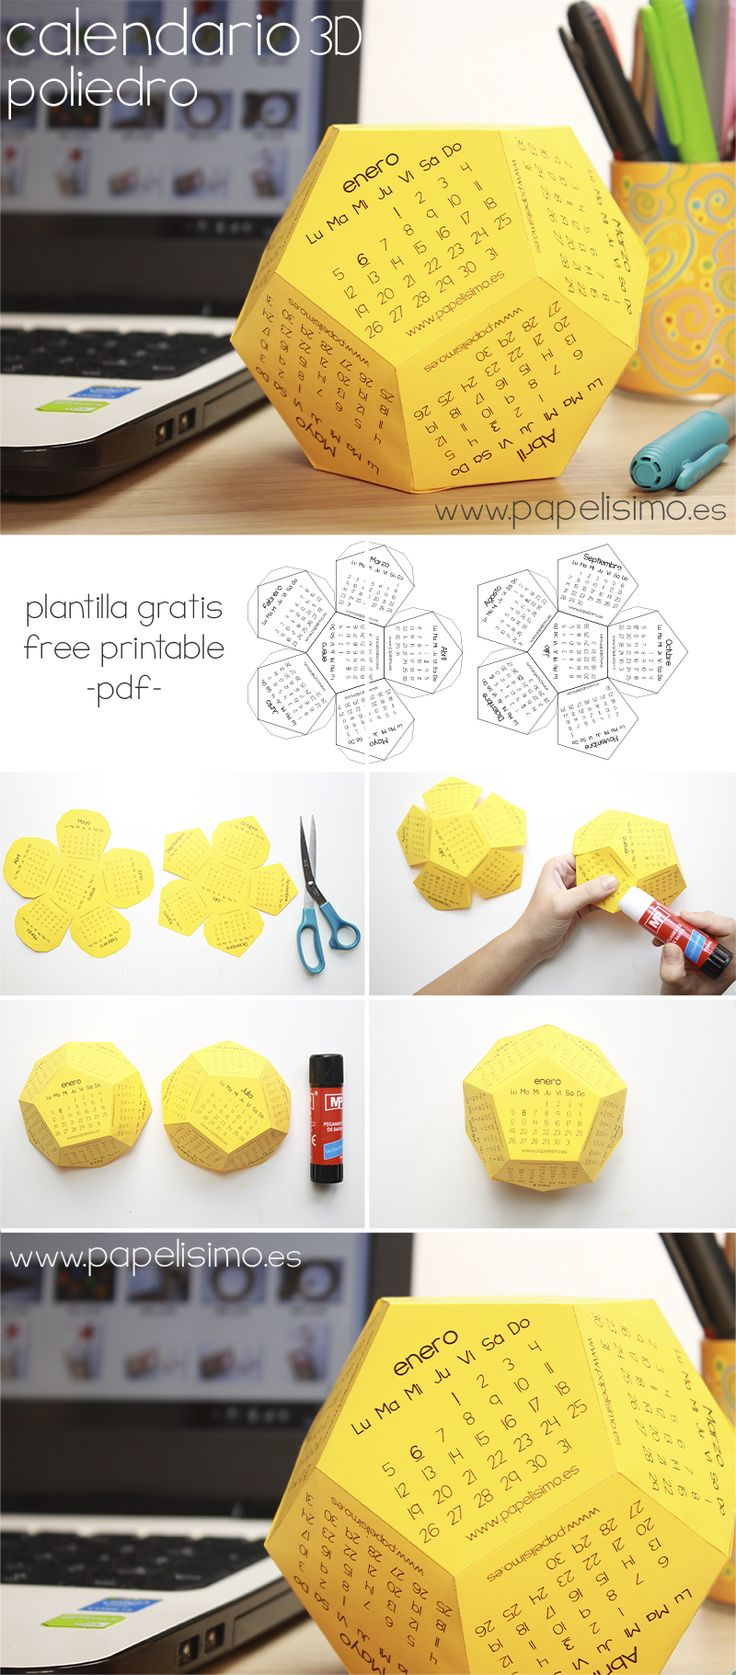 ¡Para hacer en Casa! Calendario 2015 3D.  Contacto l http://nestorcarrarasrl.wordpress.com/contactenos/  Néstor P. Carrara S.R.L l ¡En su 35° aniversario!